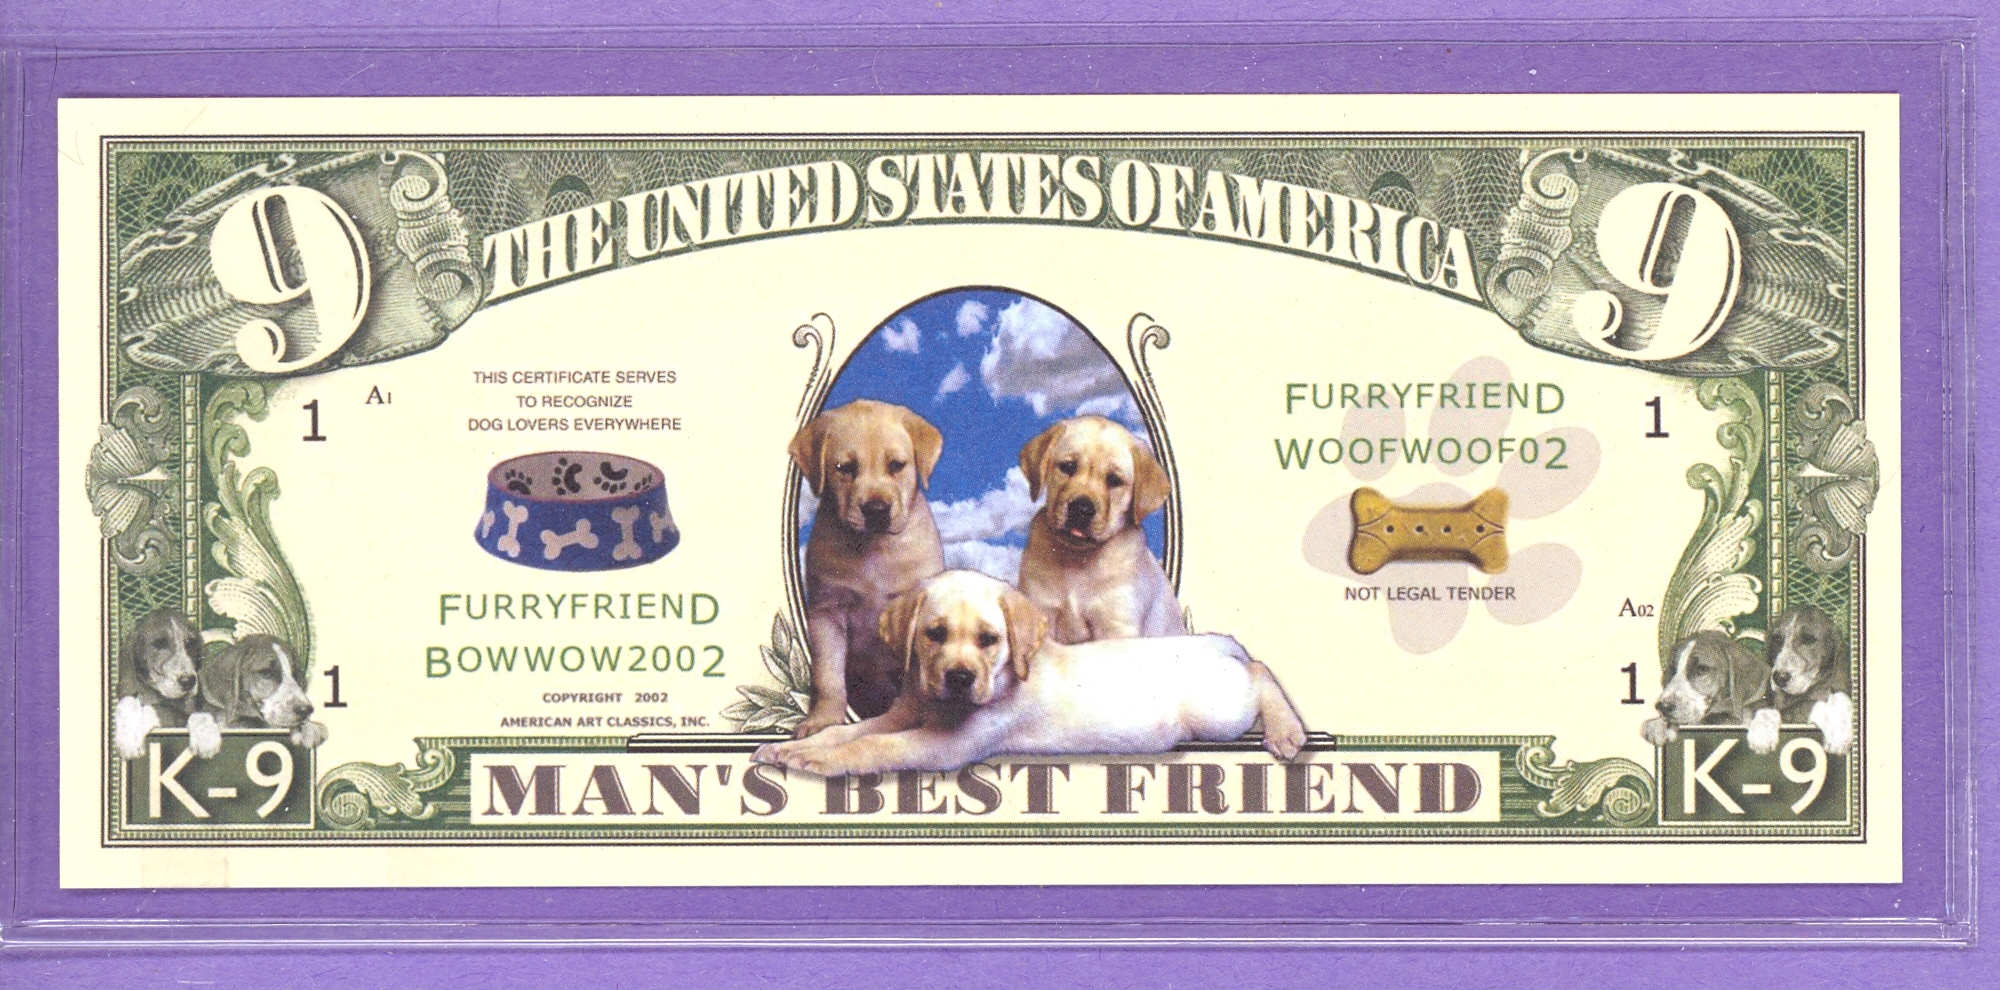 Man S Best Friend K 9 Dollars Dog Fantasy Or Novelty Note